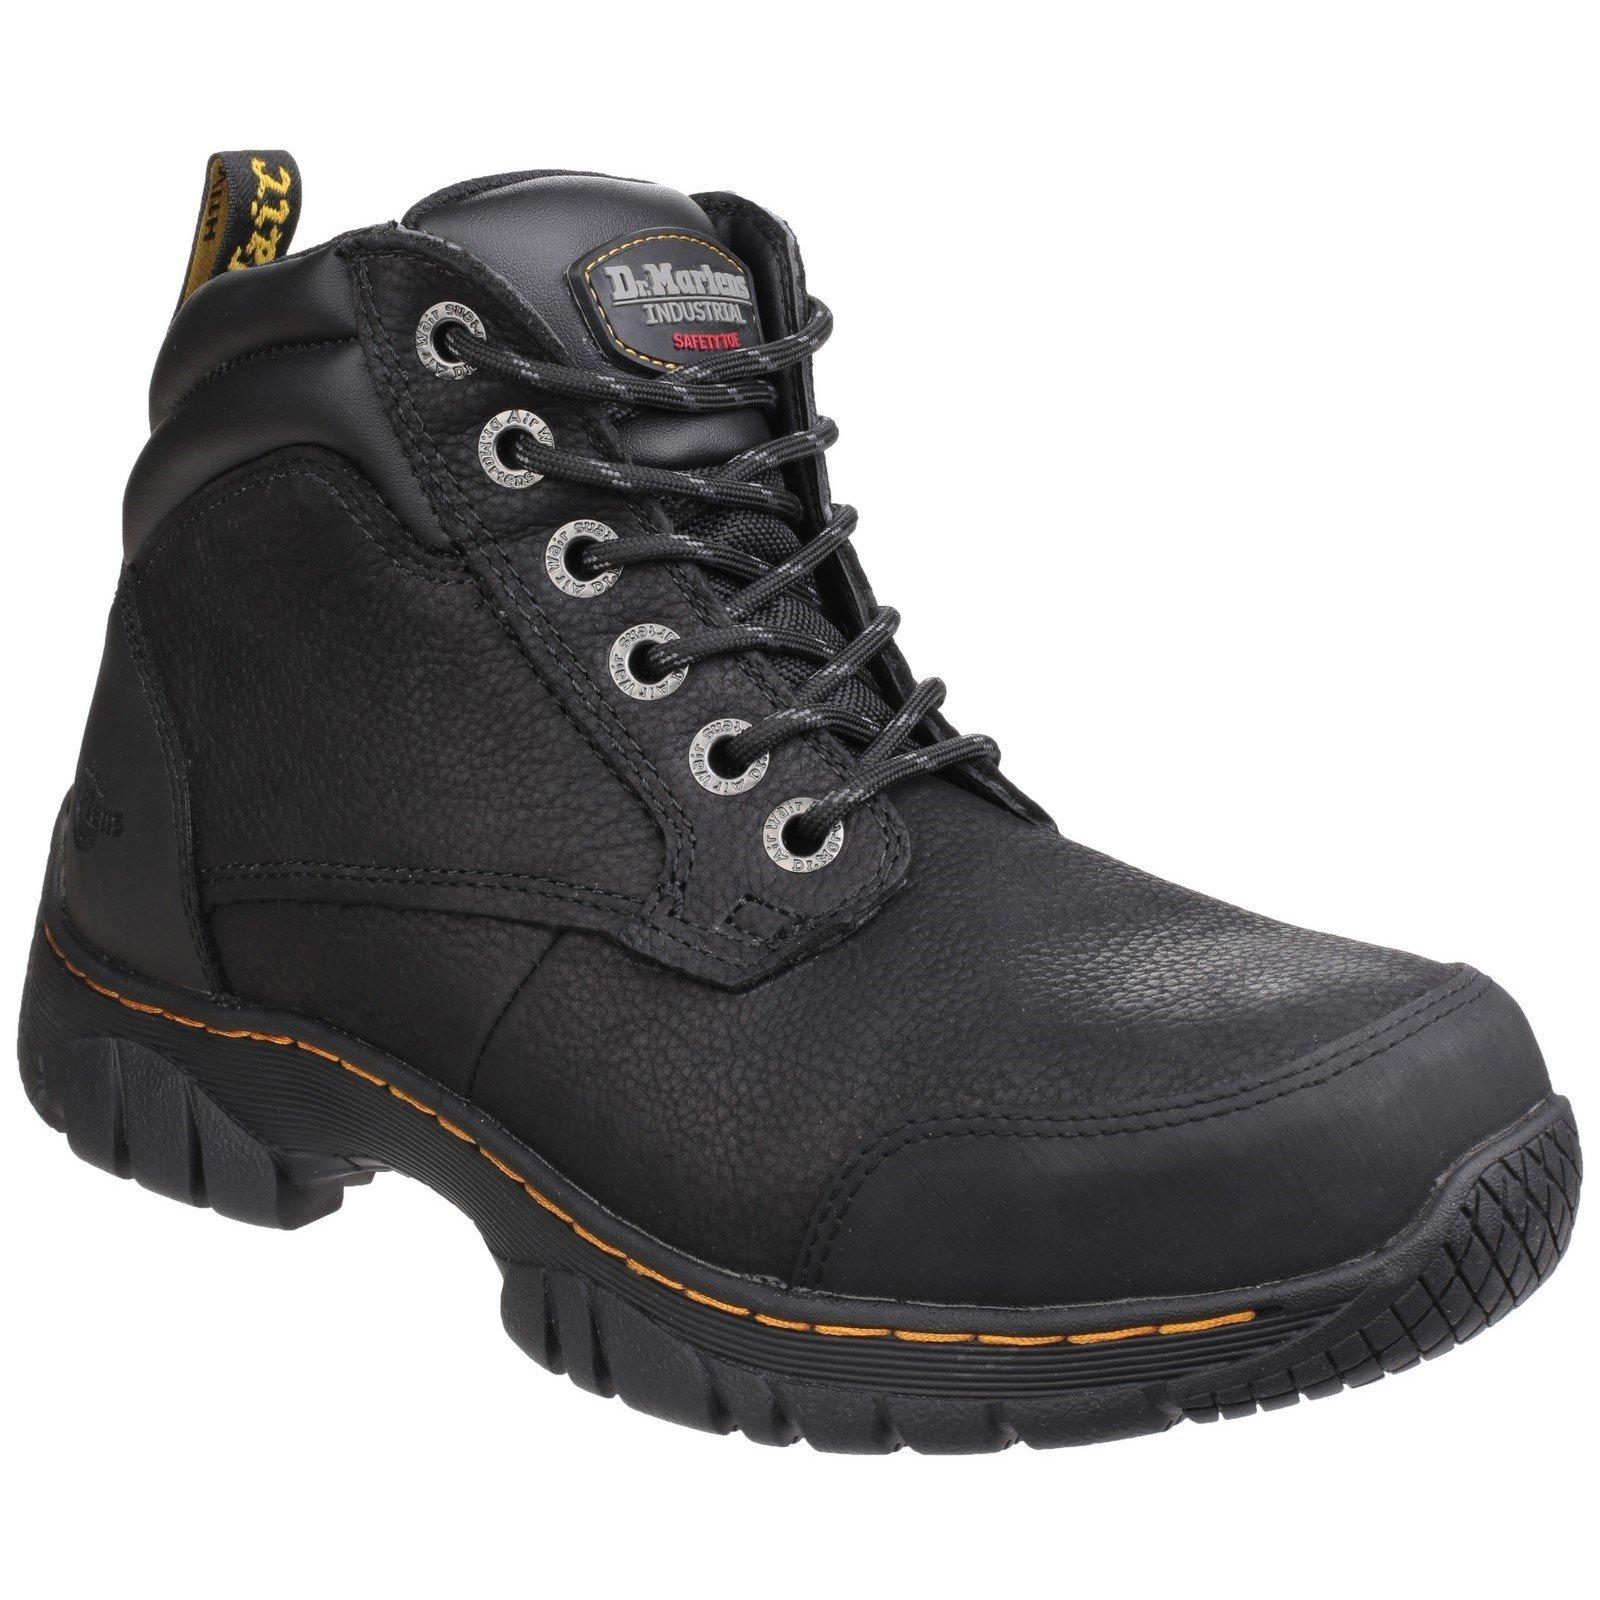 Dr Martens Unisex Riverton SB Lace up Hiker Boot Black 24533 - Black 7